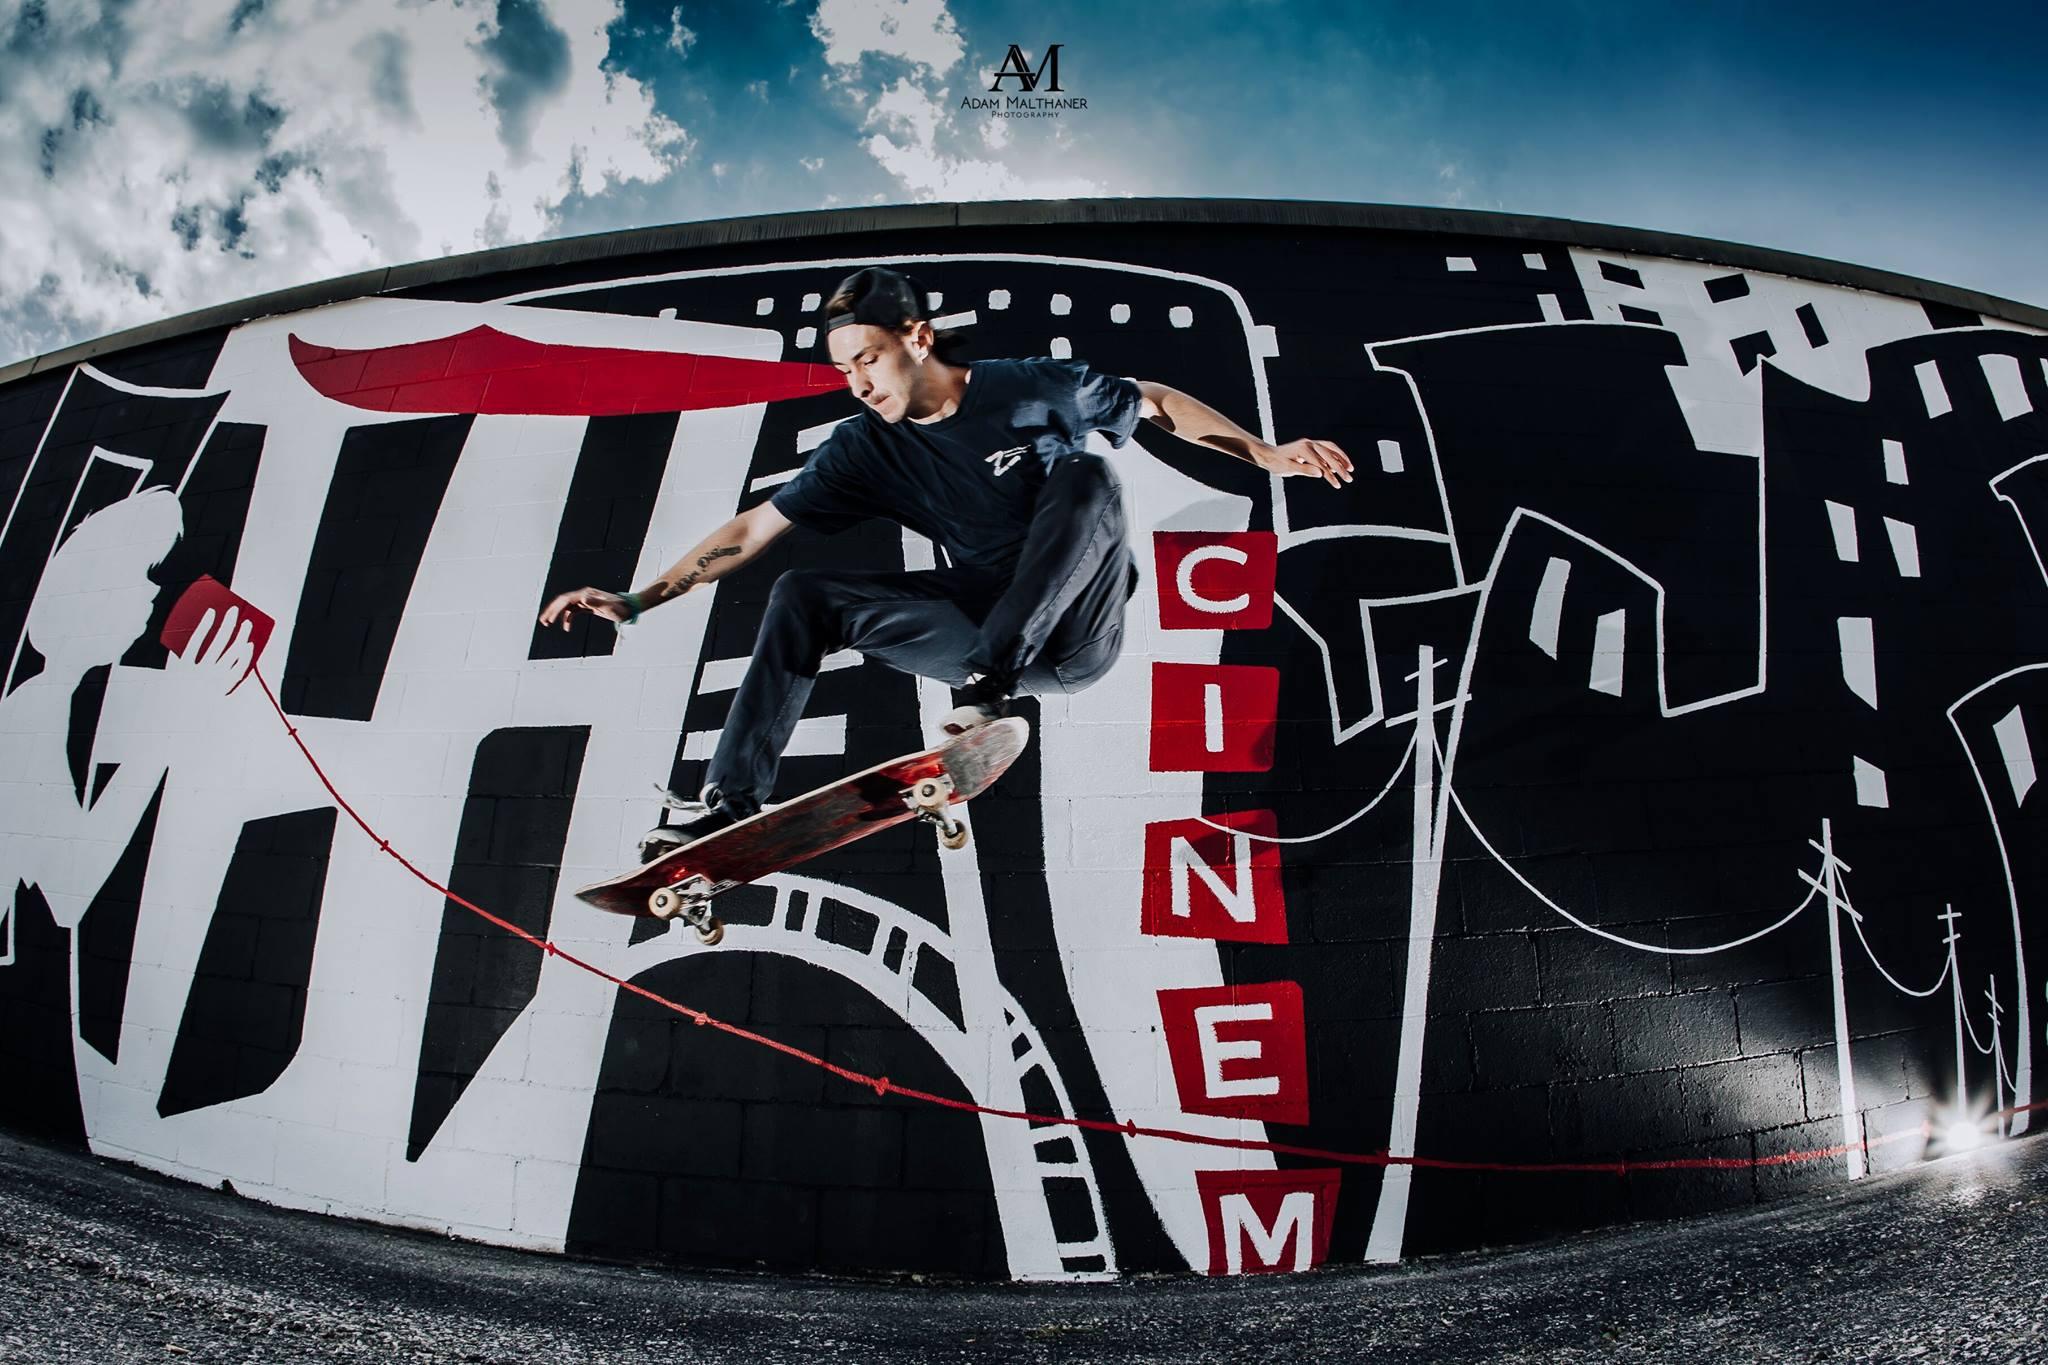 adam-malthaner-photography-street-art-mu